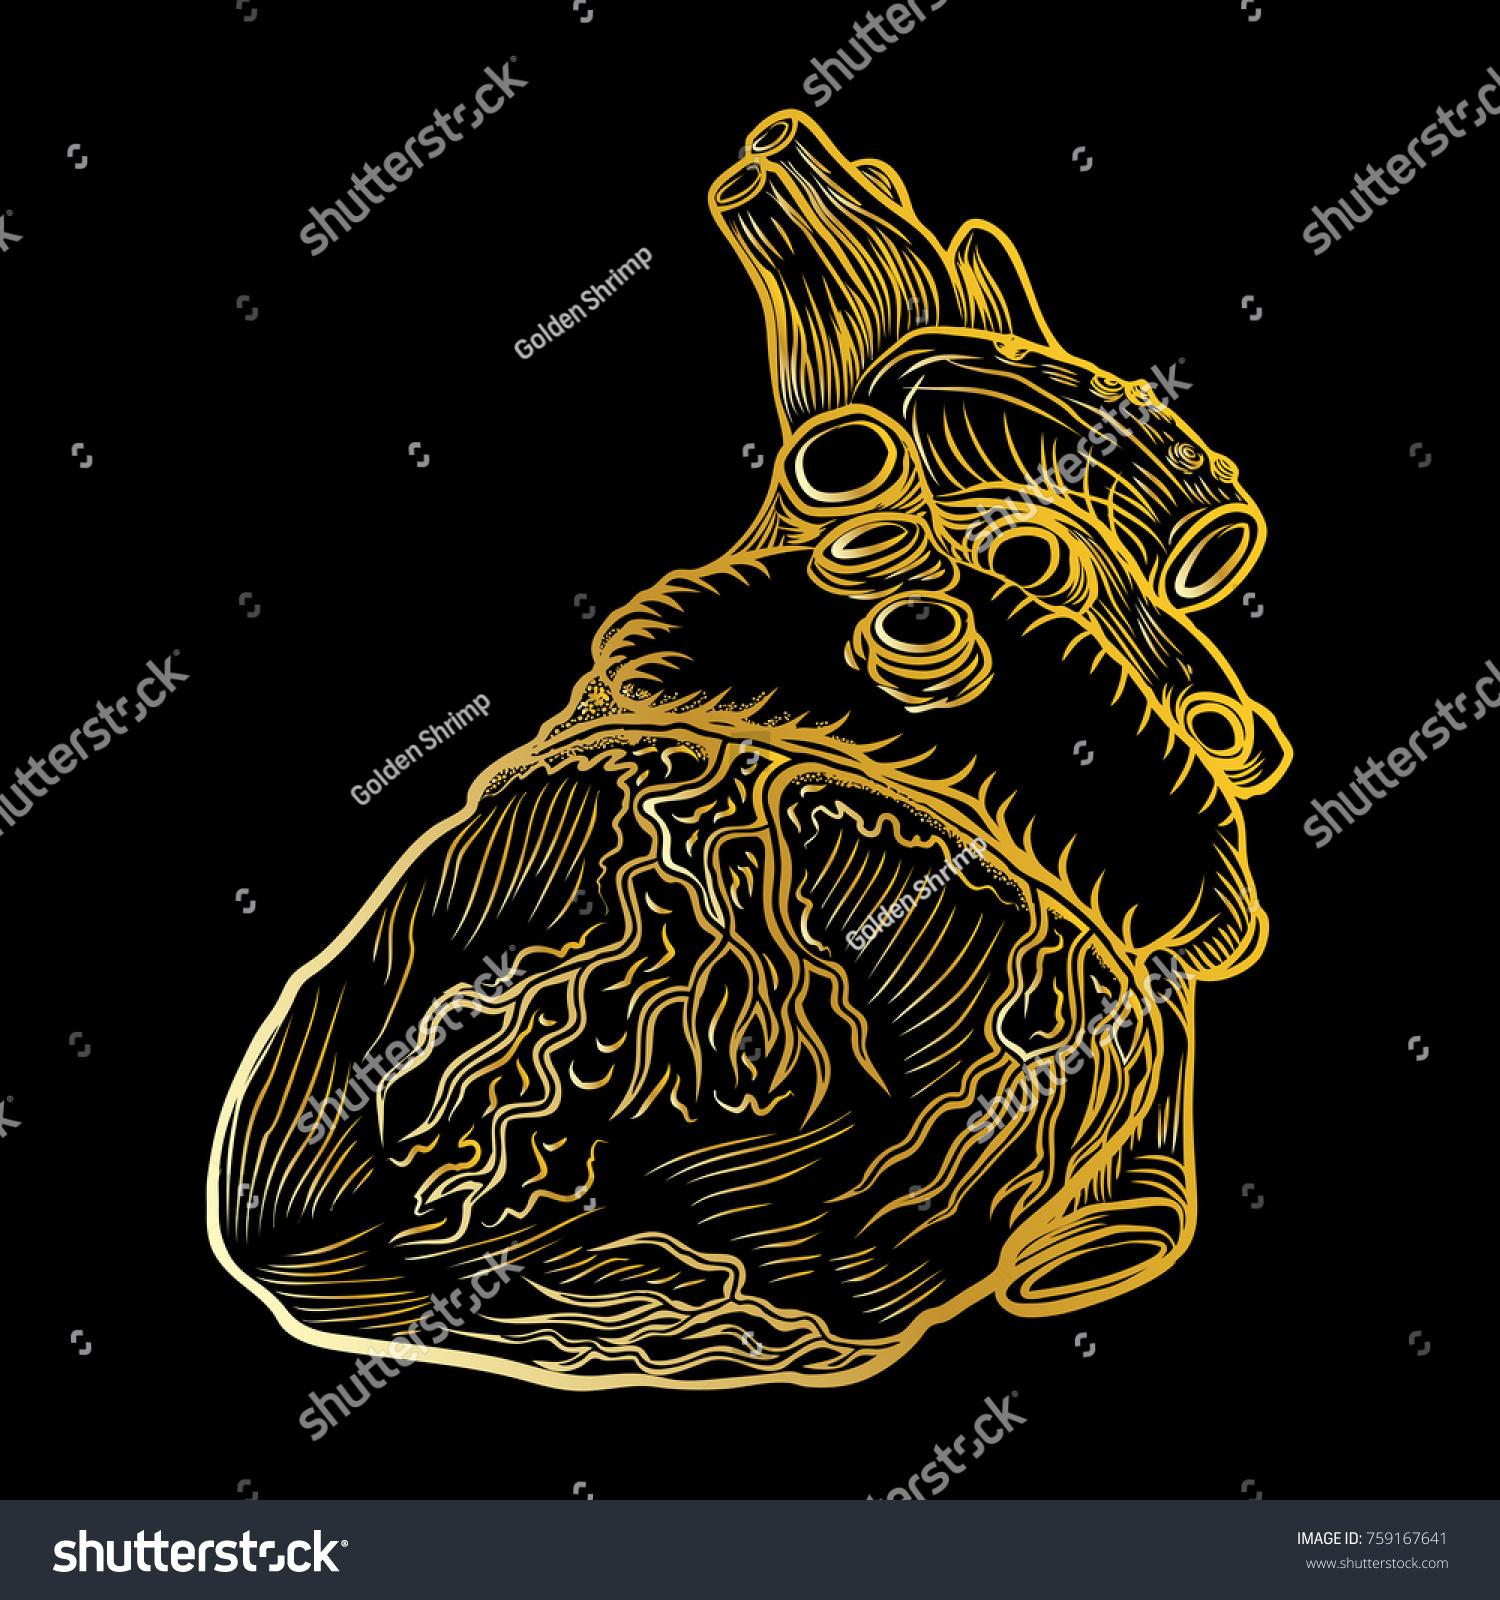 Heart Boho Black Work Dot Work Stock Vector Royalty Free 759167641